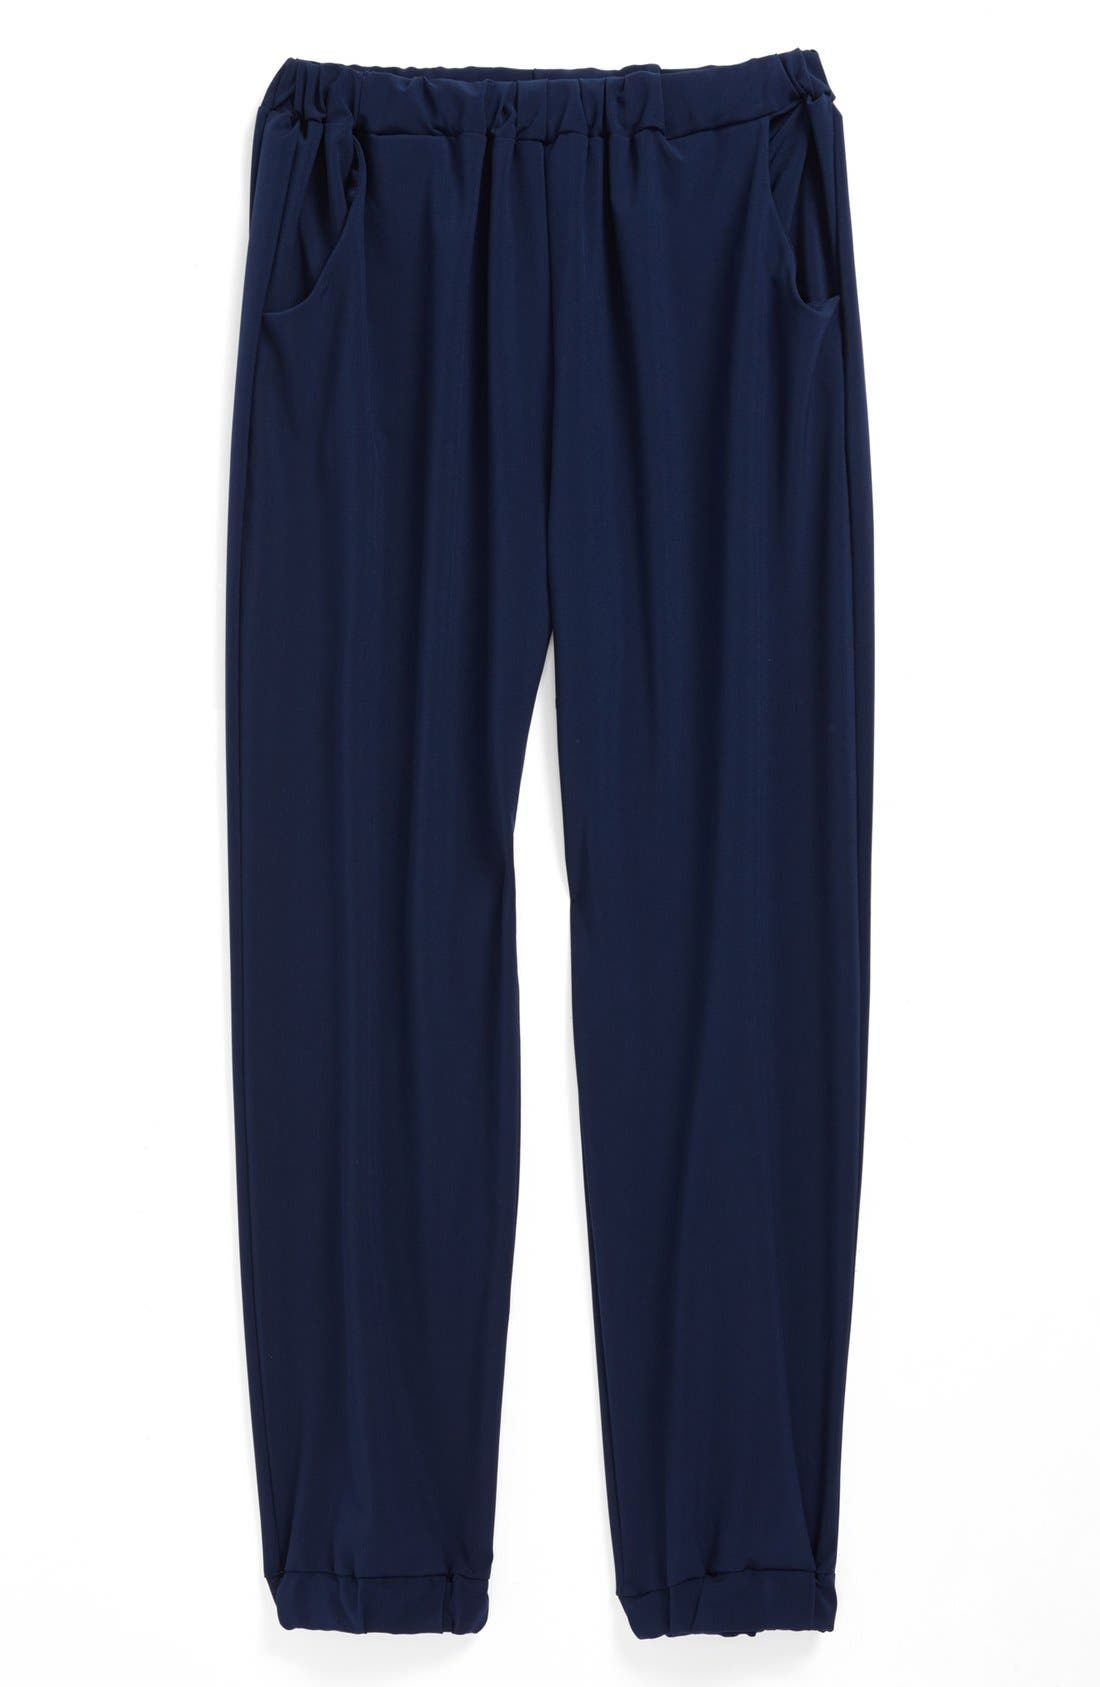 Alternate Image 1 Selected - Soprano Soft Pants (Big Girls)